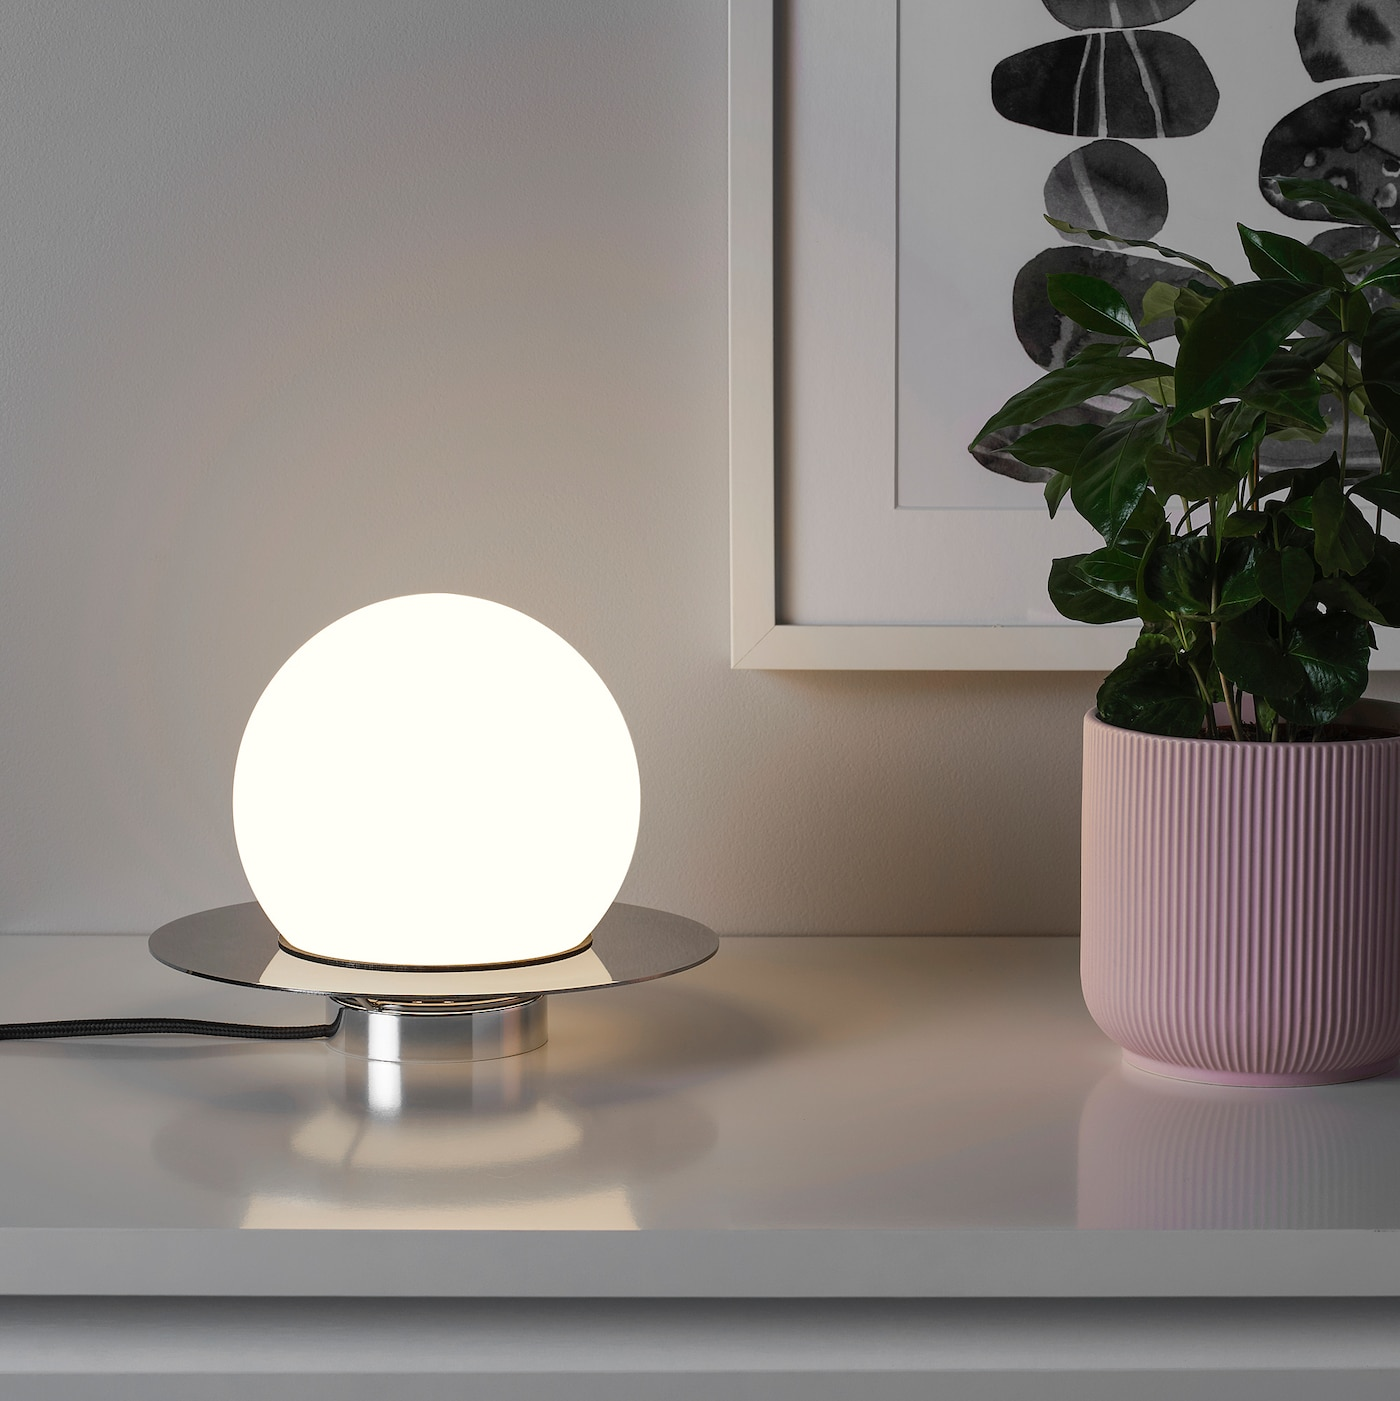 Simrishamn Lampada Da Tavolo Parete Cromato Bianco Opalino Vetro 16 Cm Ikea Svizzera